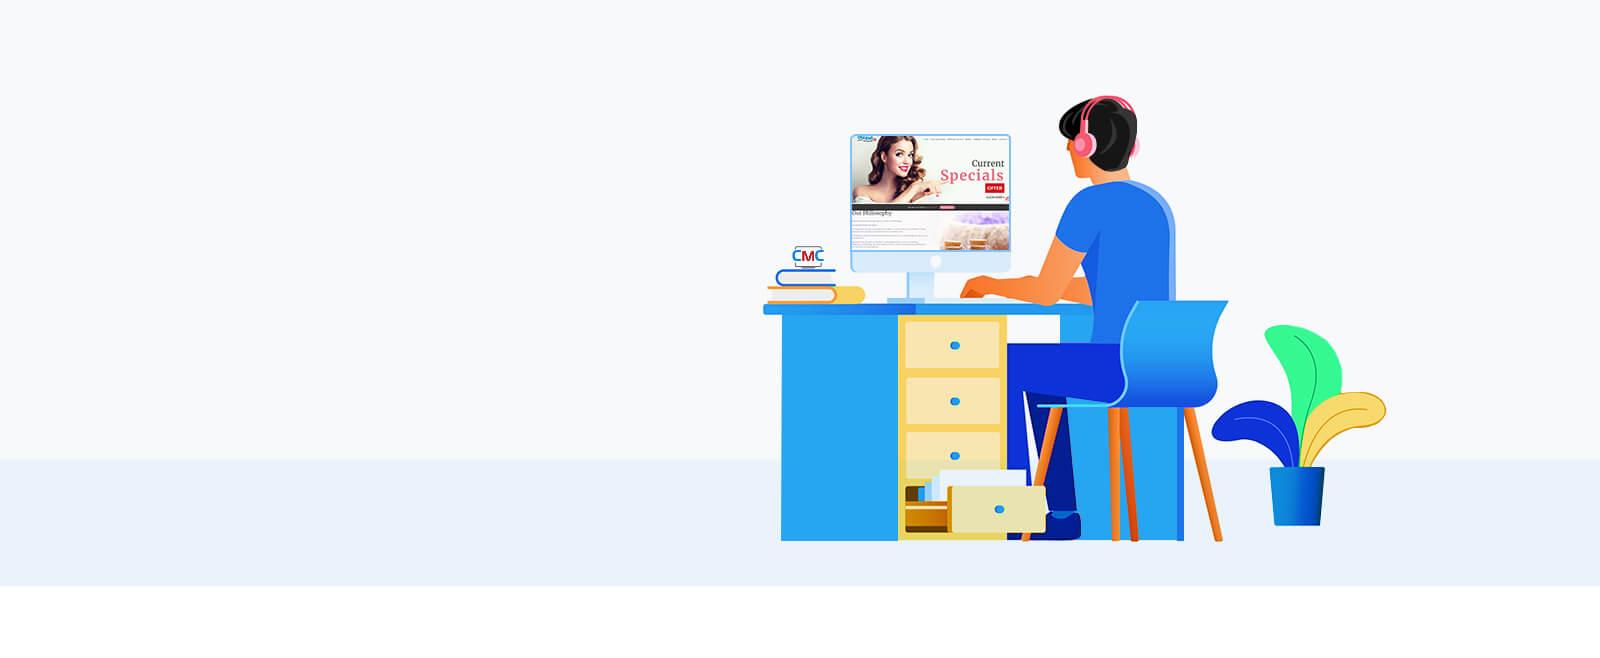 London web design solutions